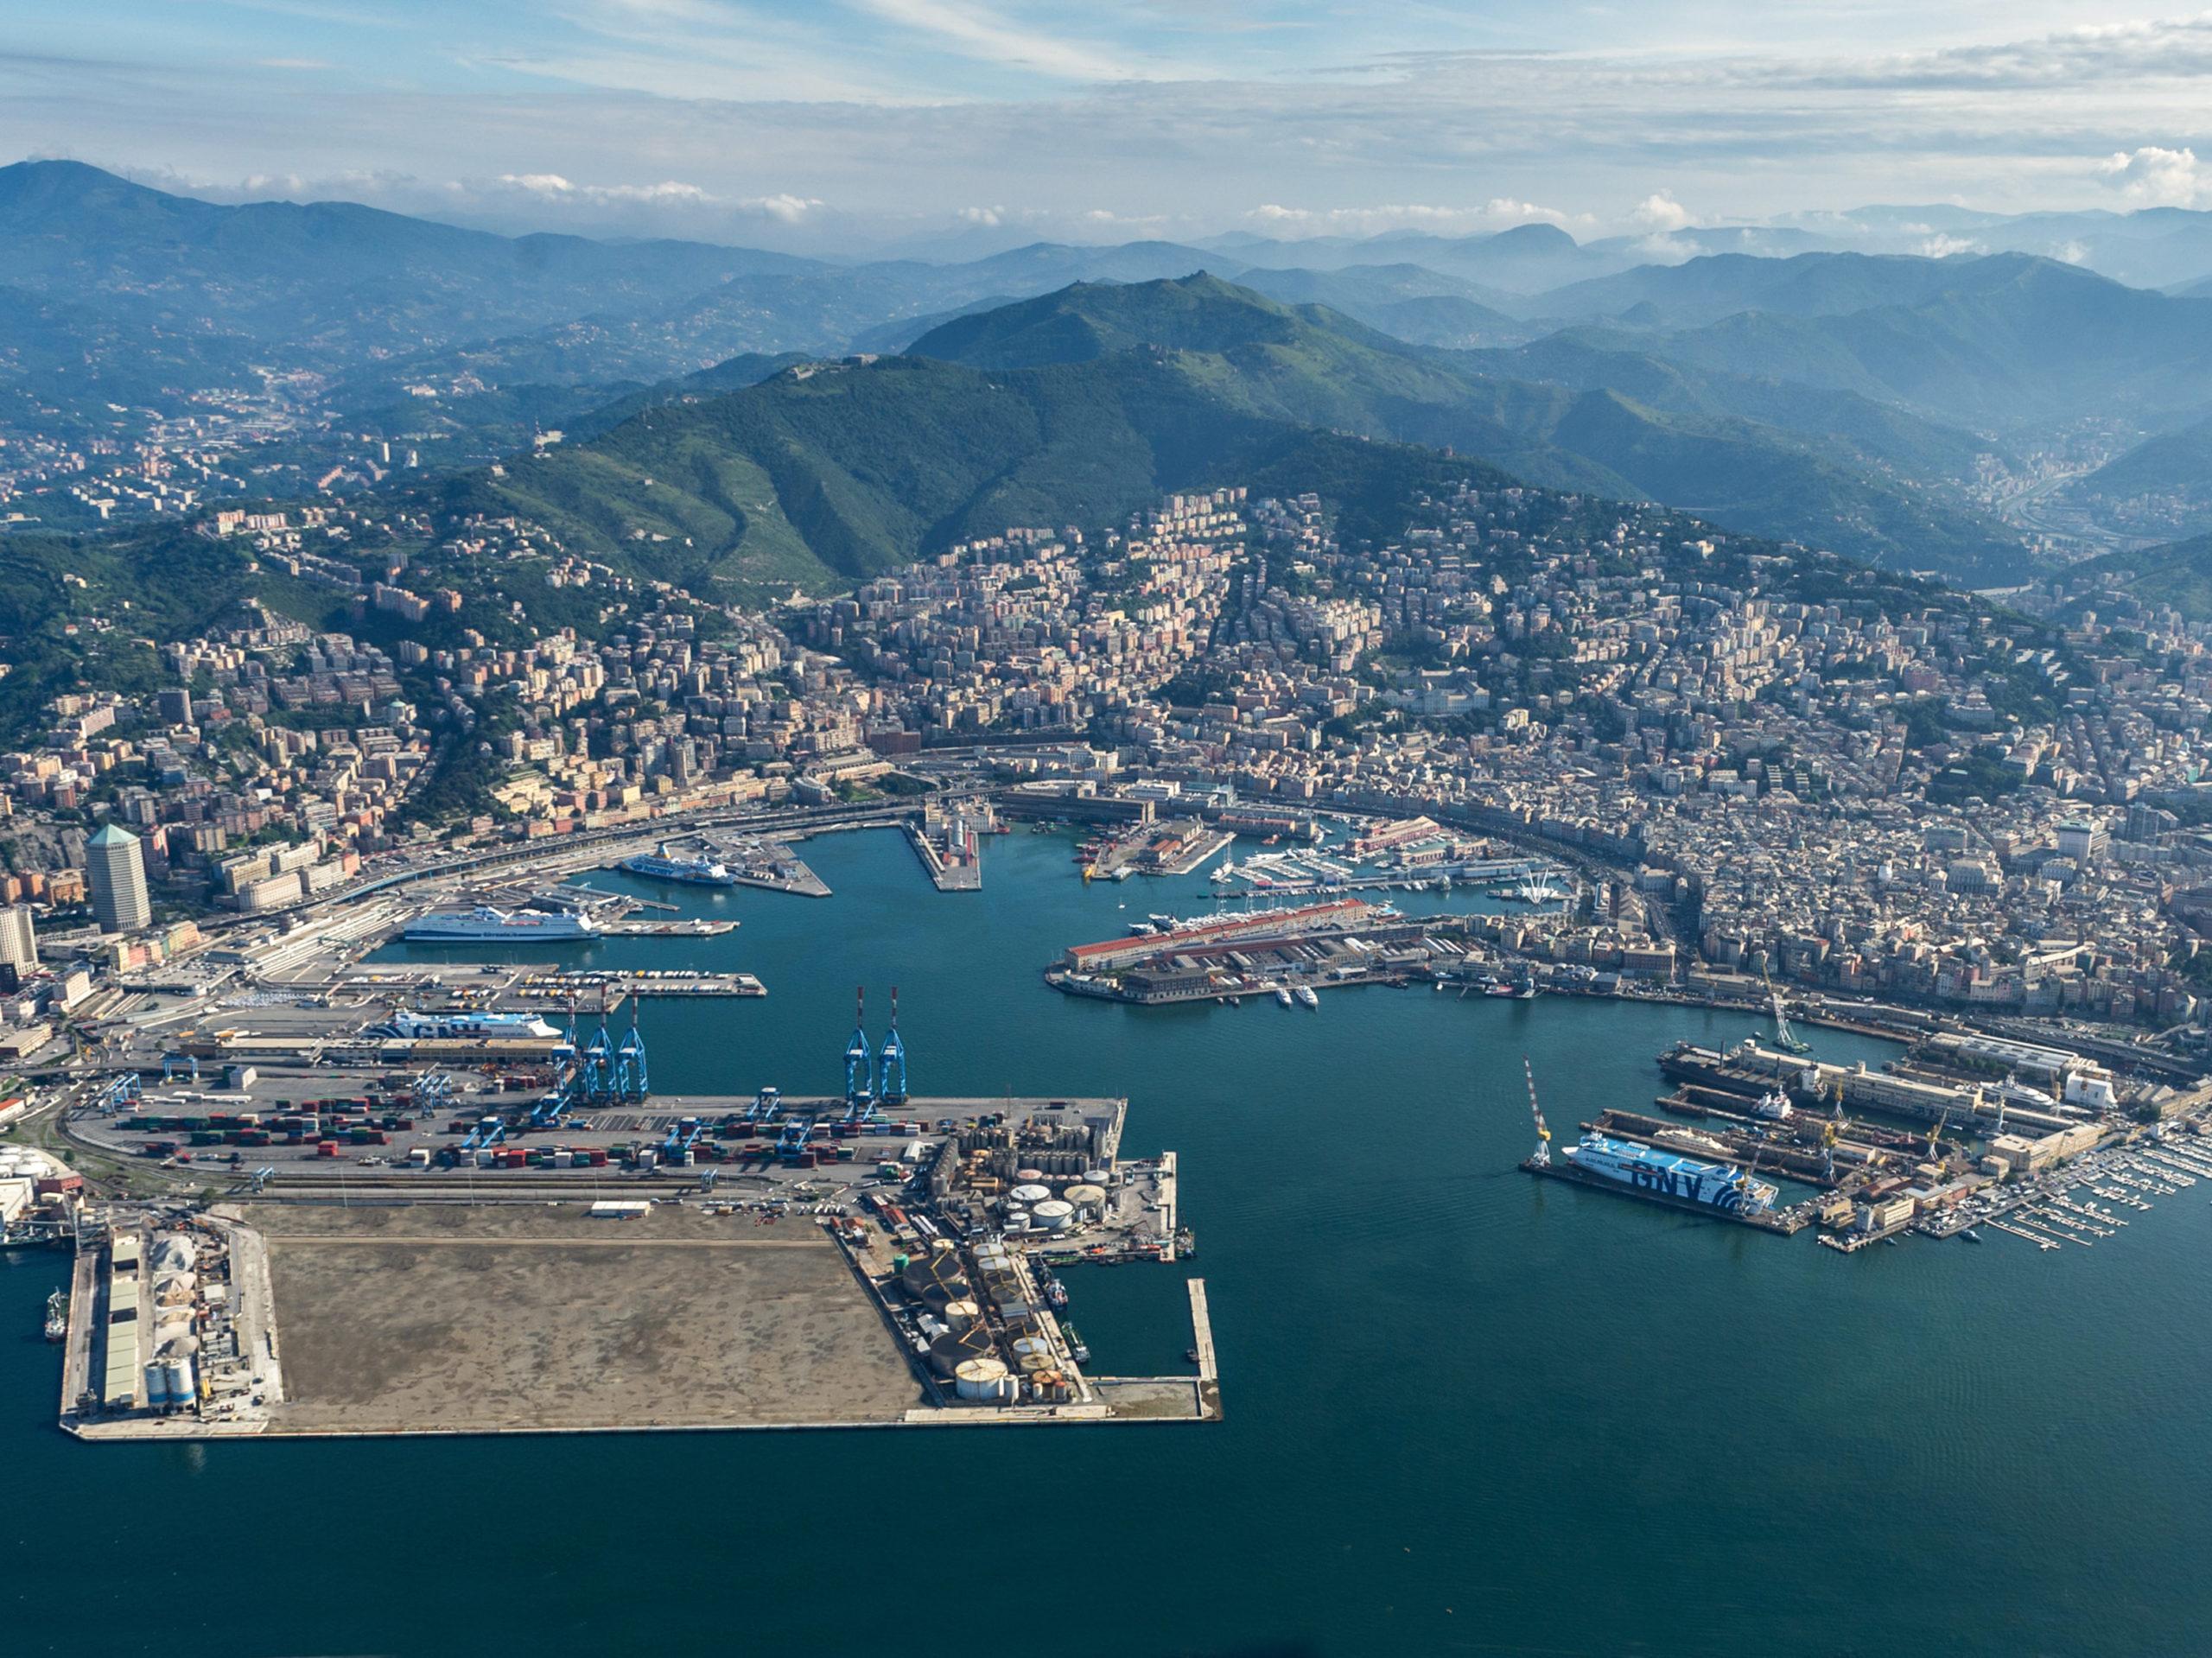 Port of Genoa. Port Authority of the Western Ligurian Sea